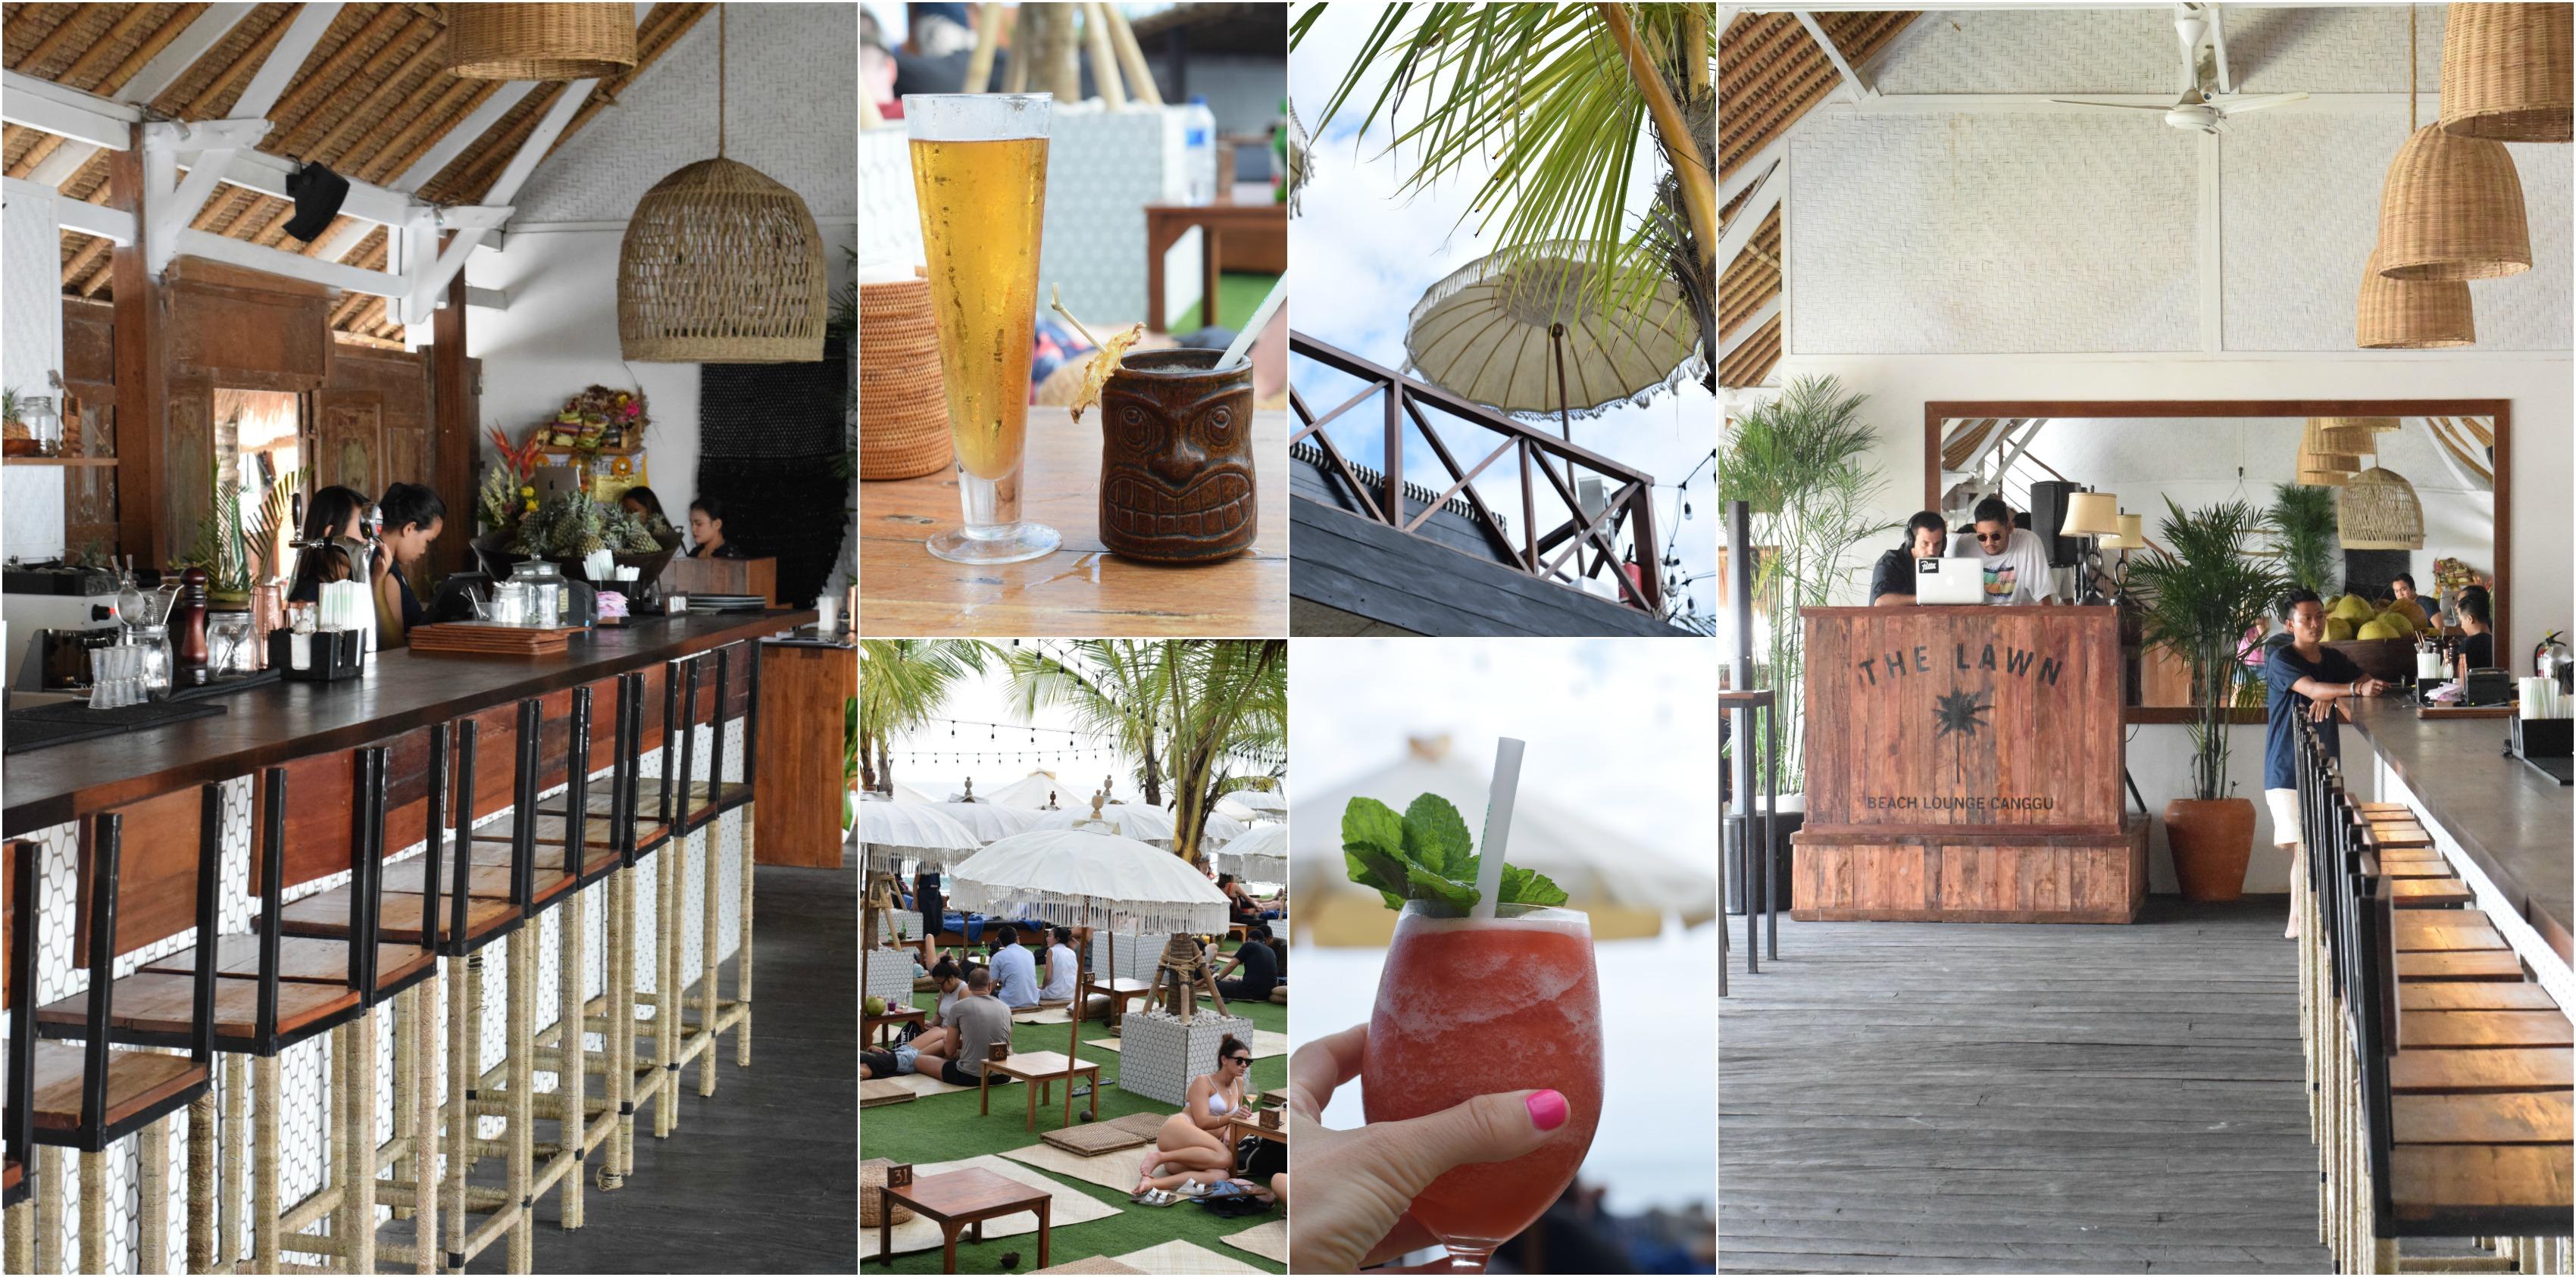 The Lawn - Canggu - Seminyak - Bali, Indonesia - Our Bali Trip - Communikait